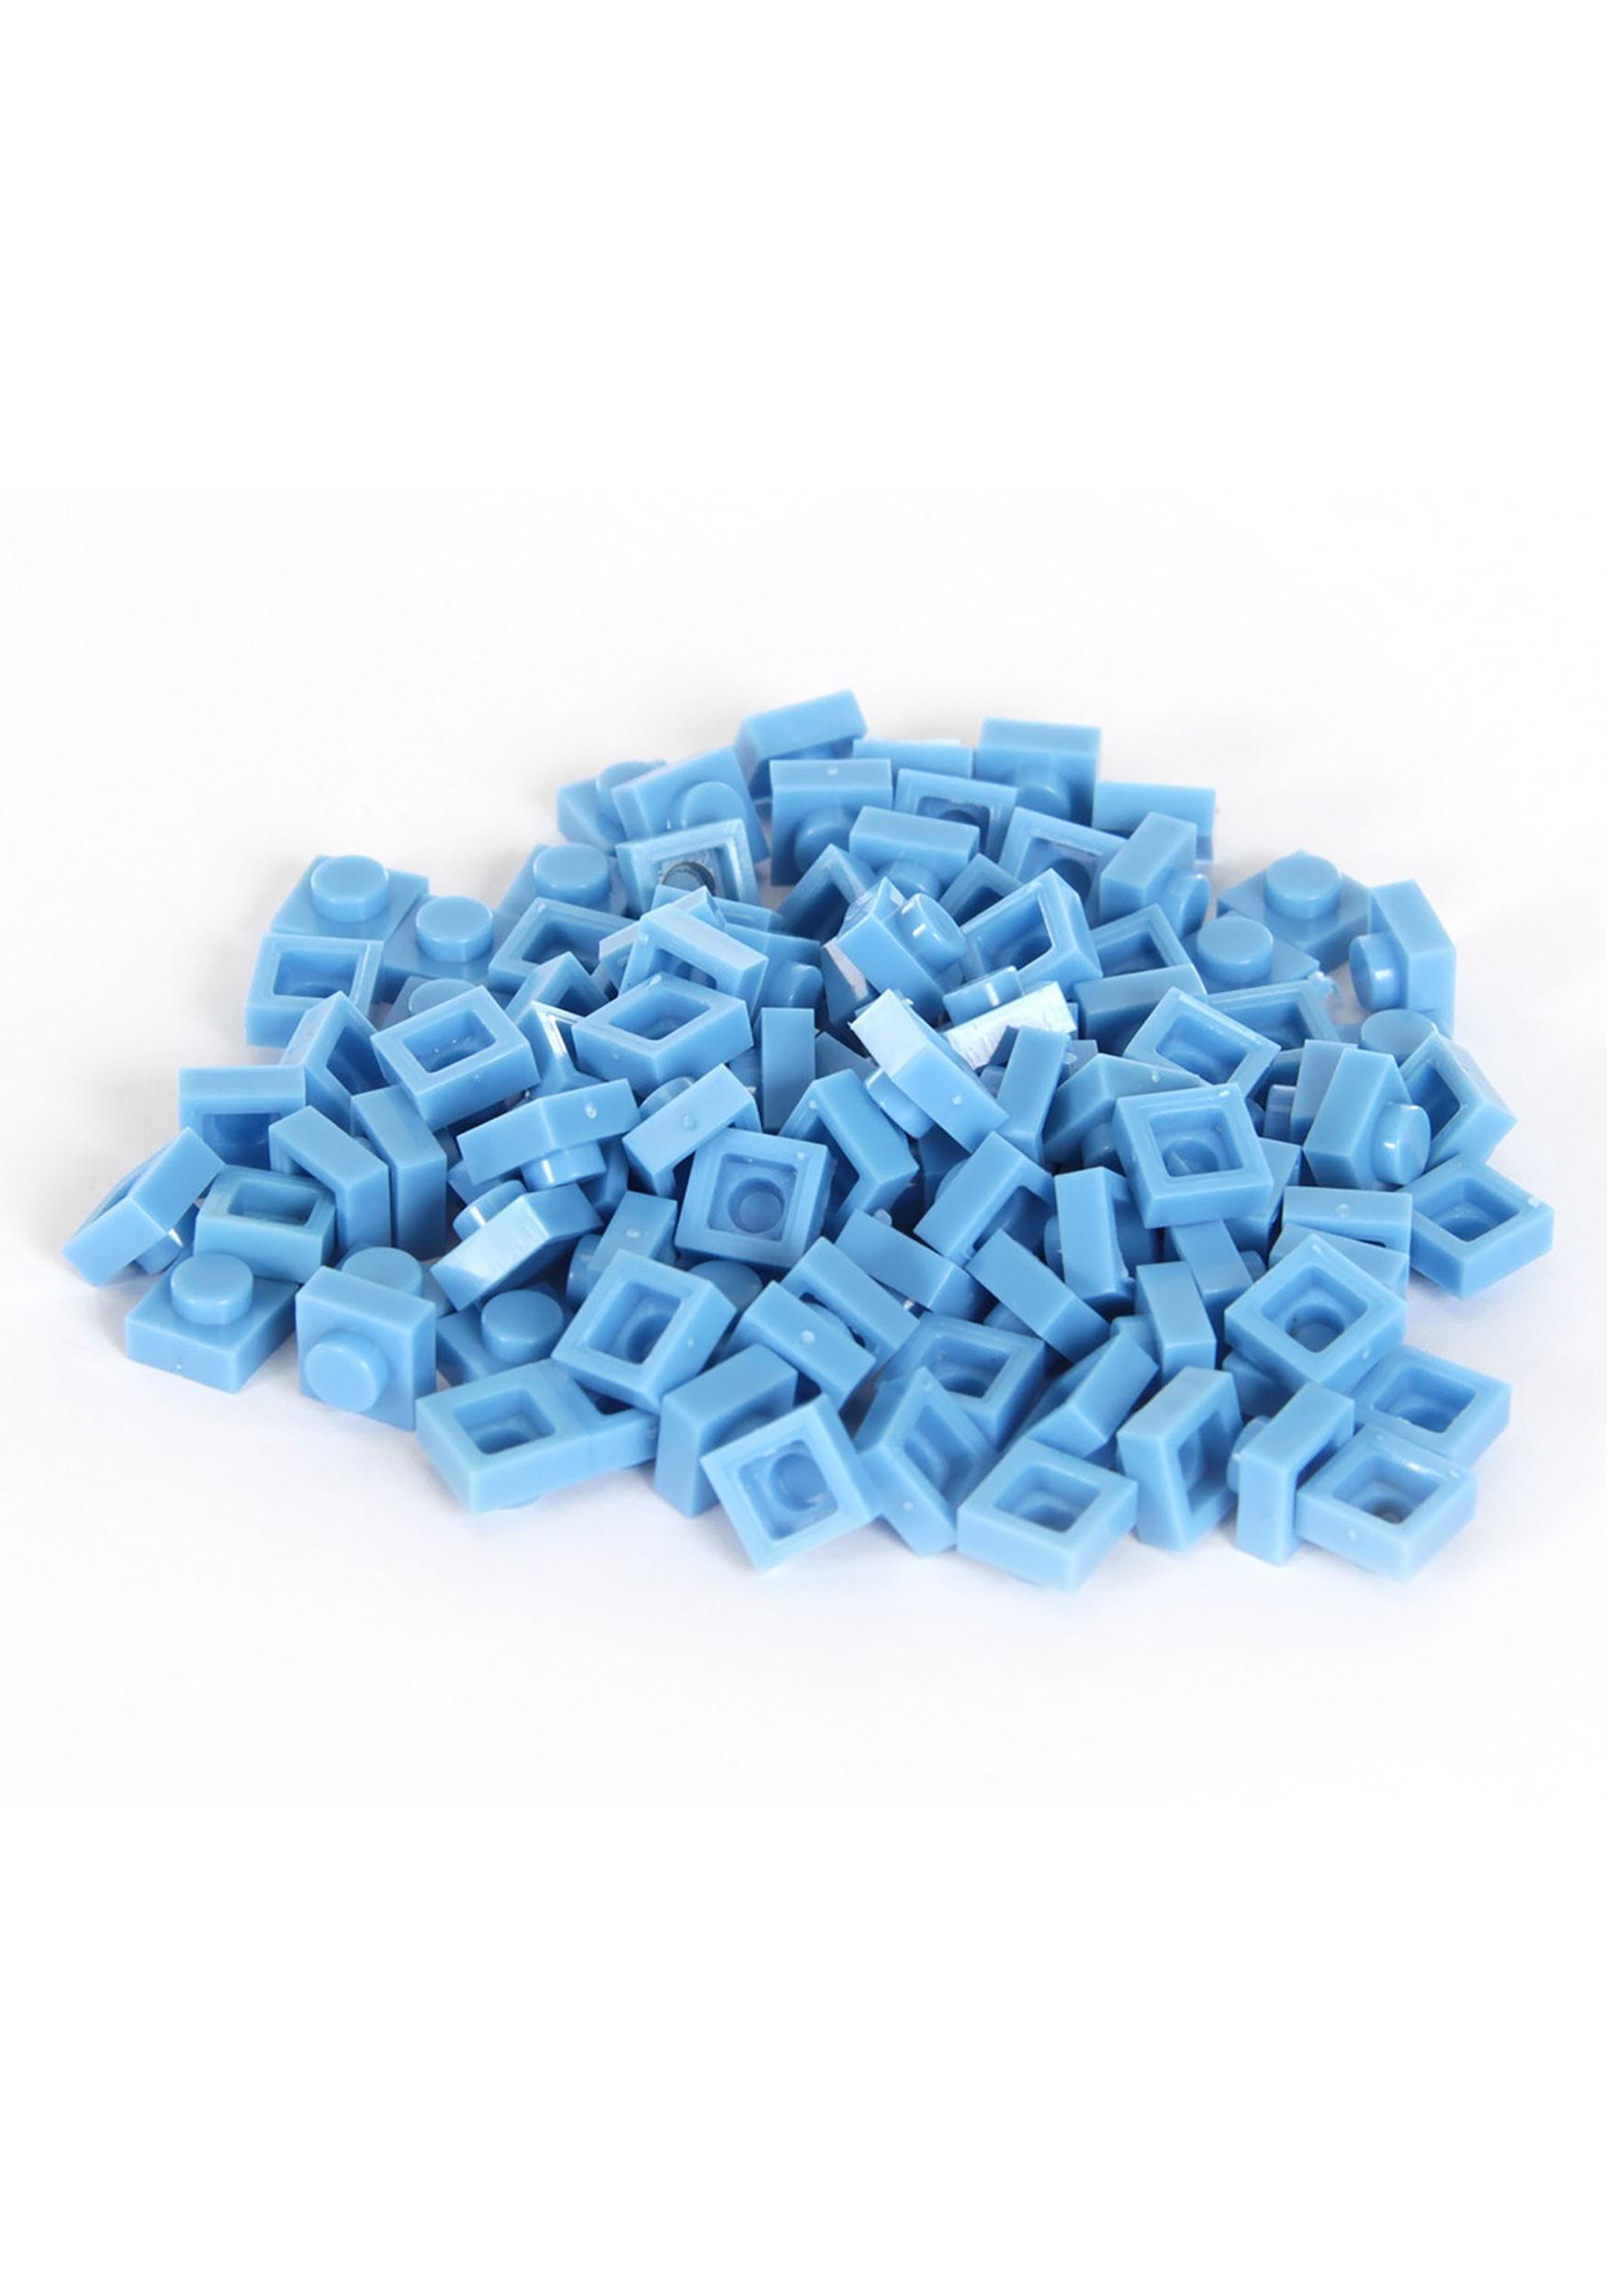 Light Blue Bricky Blocks 100 Pieces 1x1